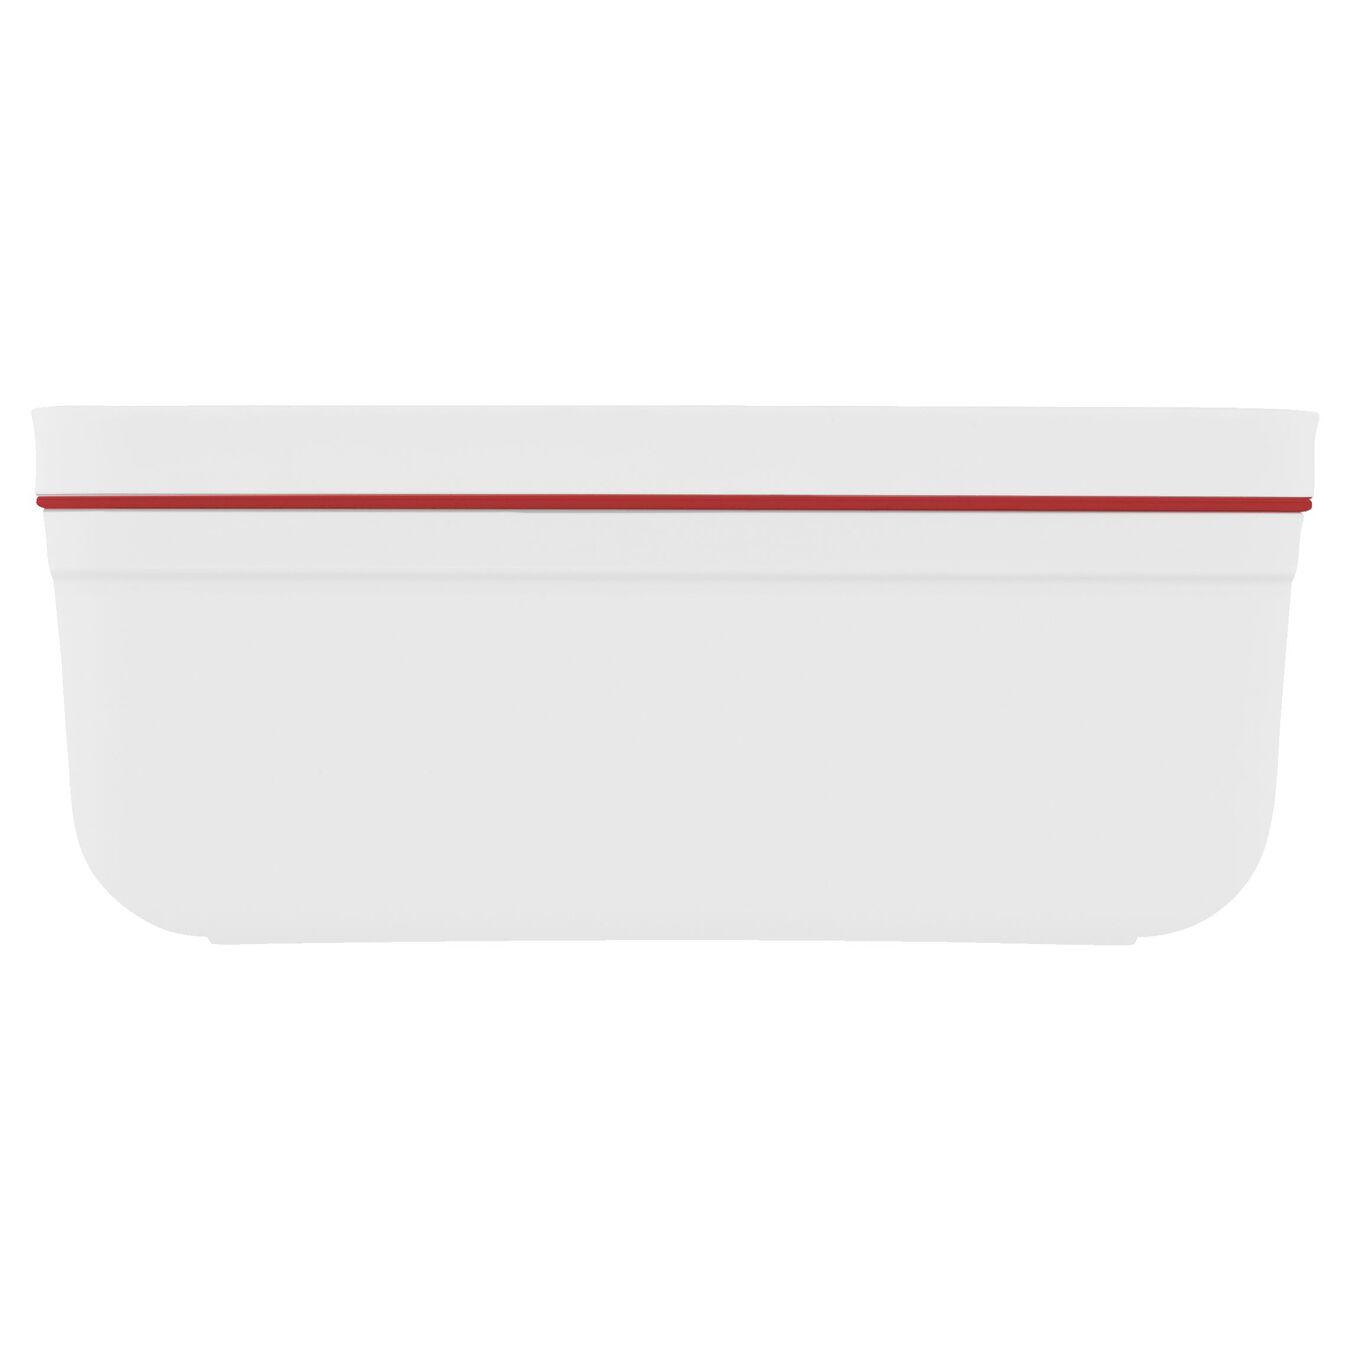 Vakuum Lunchbox, M, Kunststoff, Weiß-Rot,,large 3